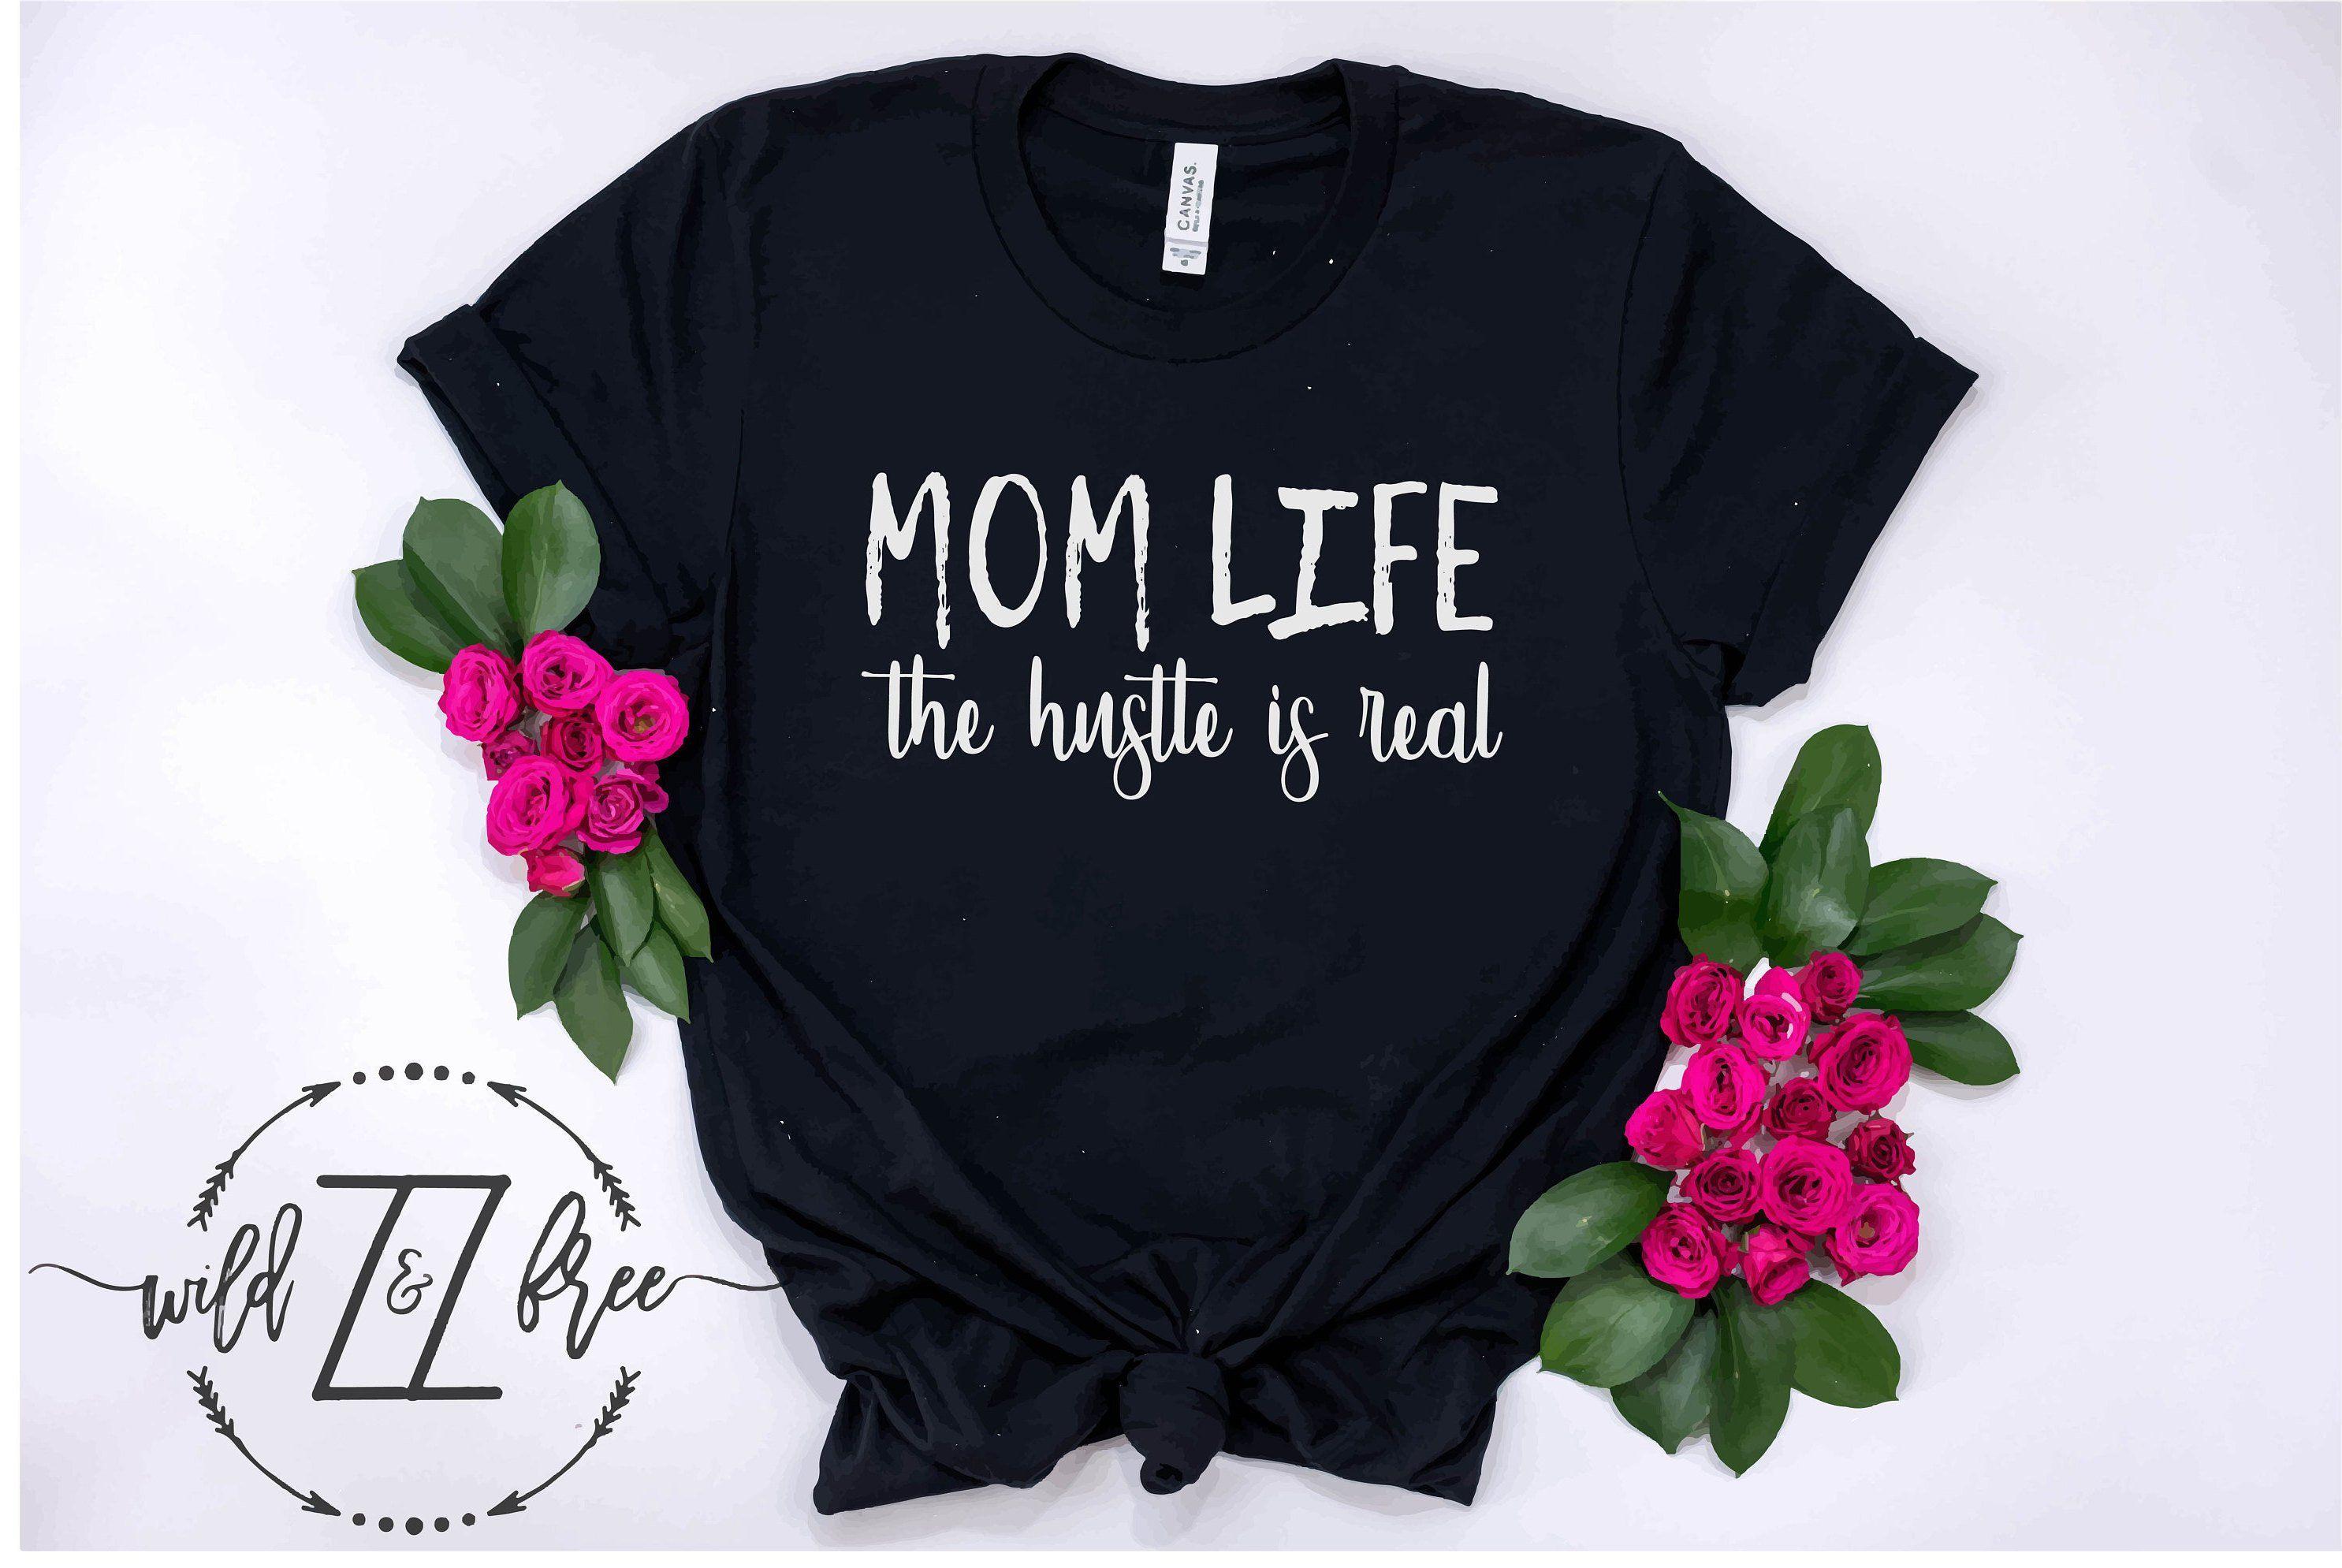 Mom Life Funny T Shirts Funny Sayings Unisex Women S T Shirt Shirts For Women Mothers Day Mother S Day Mom Wife Shirt Mom Life Funny T Shirts For Women